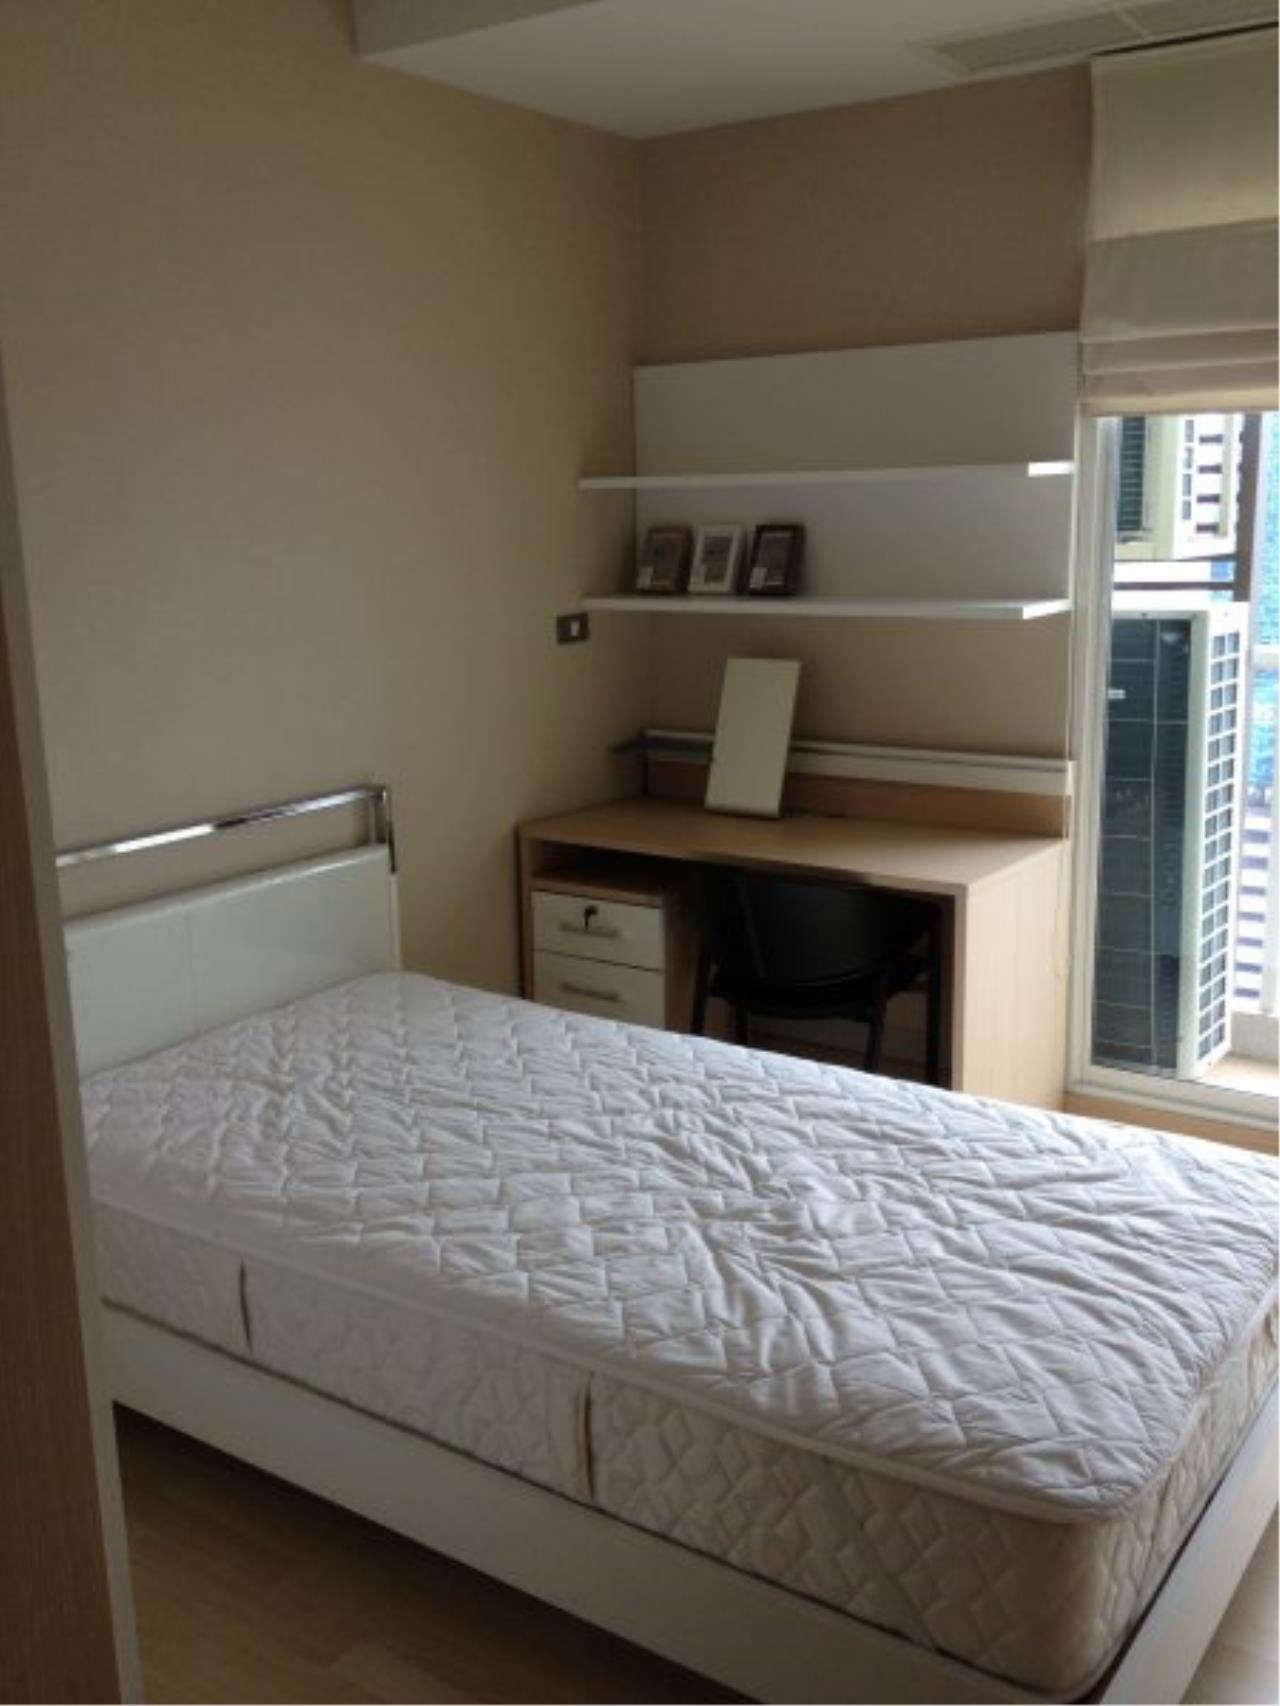 Piri Property Agency's Modern 2 Bedrooms in the 59 Heritage Bulding for rent on high floor 4